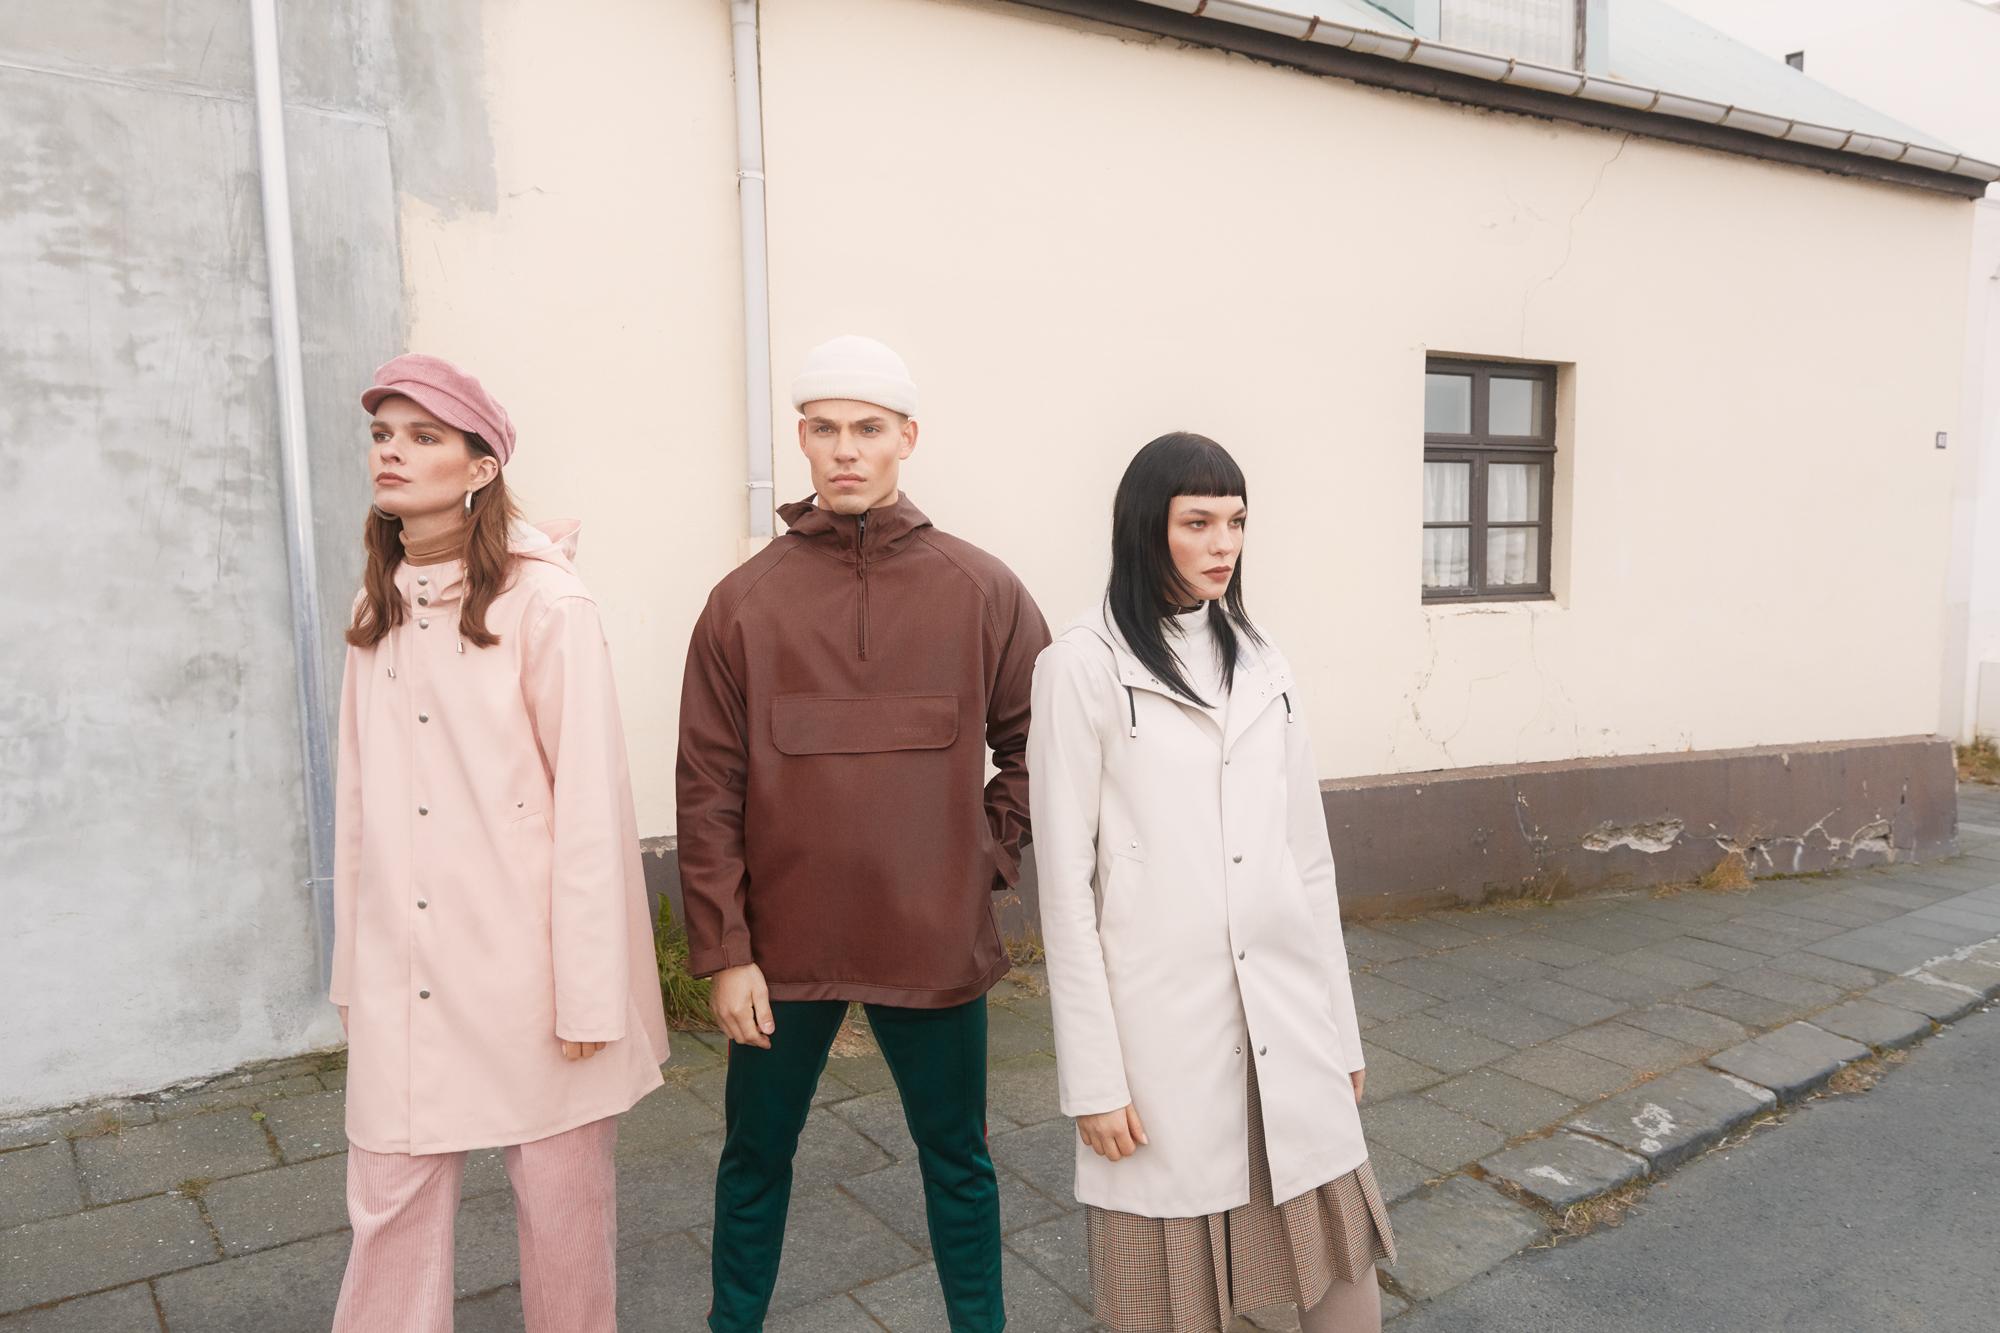 180930-Reykjavik-Raincoats-Campaign-02-288.jpg